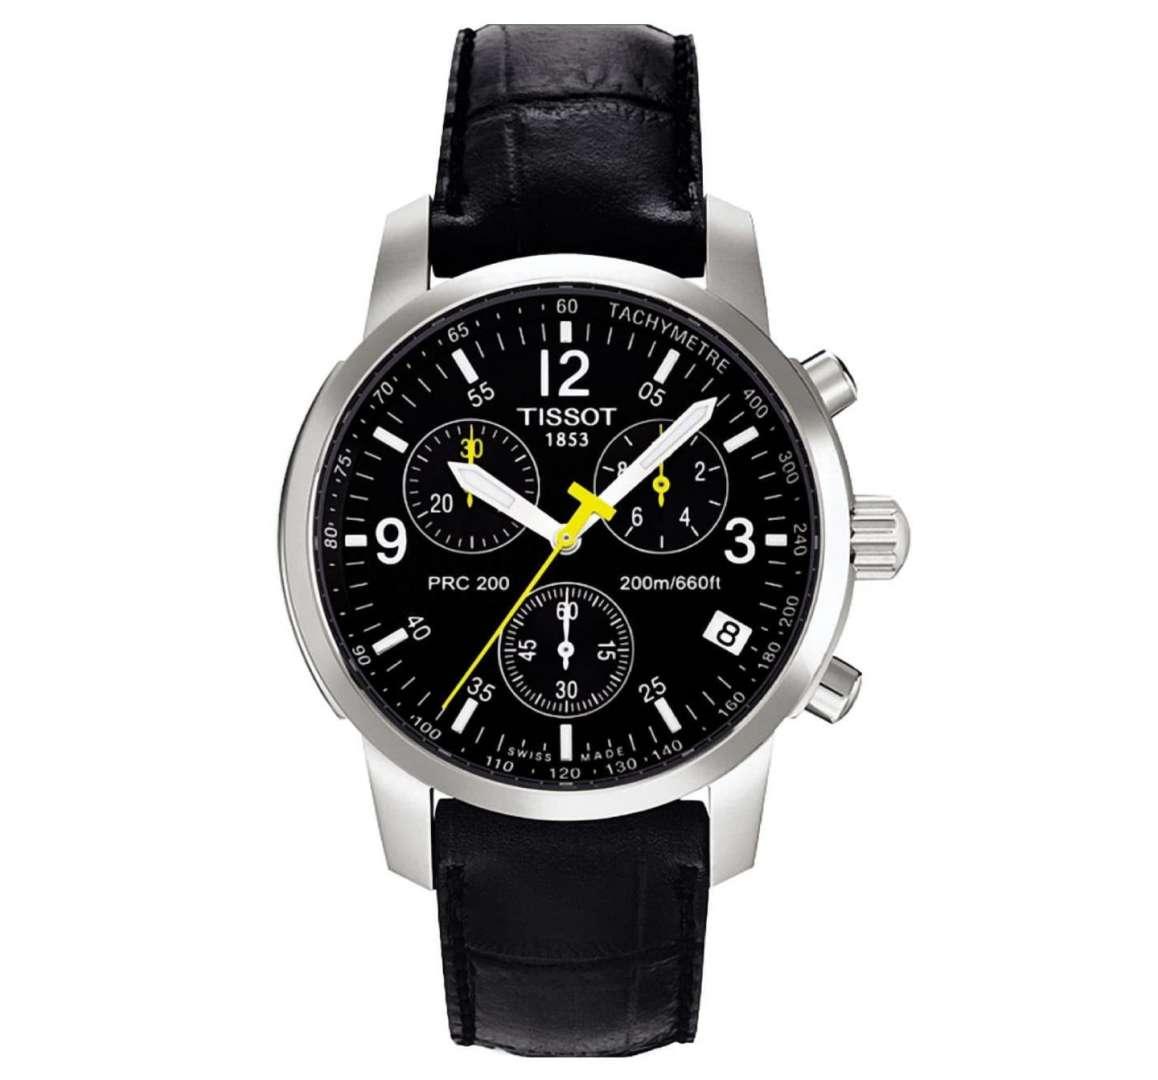 שעון יד אנלוגי tissot t17.1.526.52 טיסו